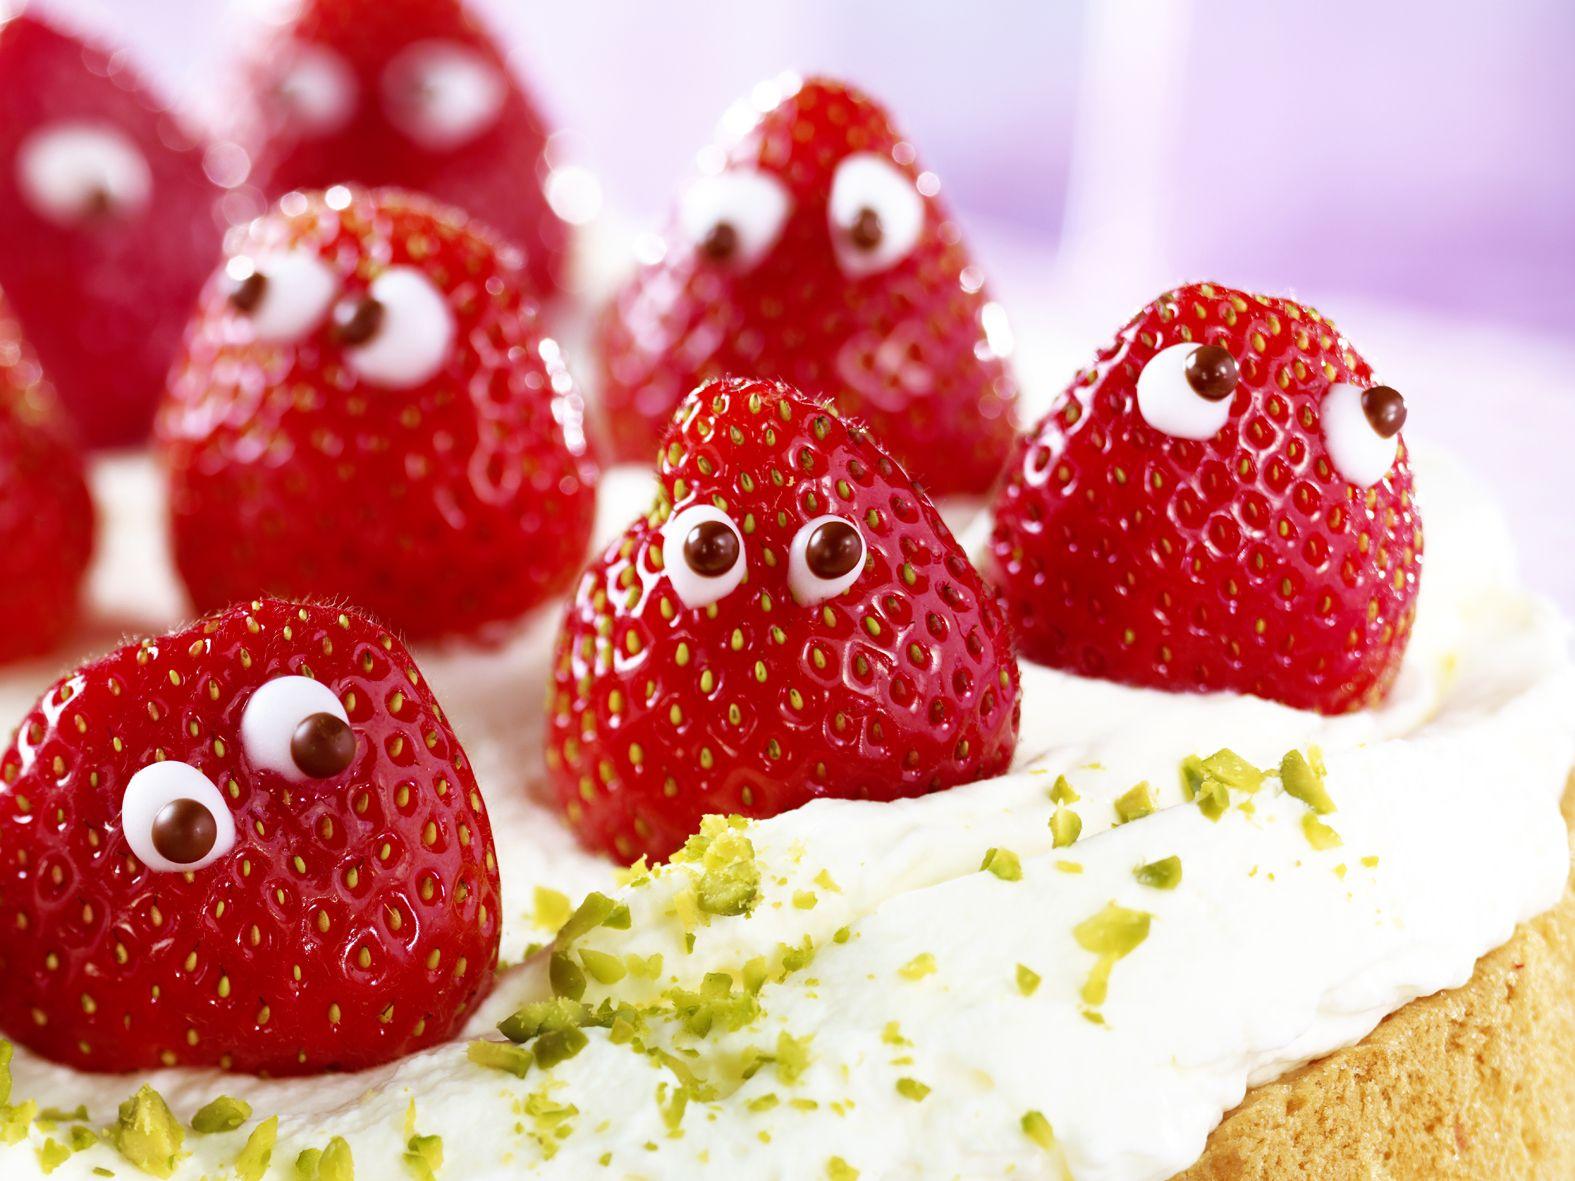 #strawberry #strawberries #cakedecoration #erdbeeren # ...